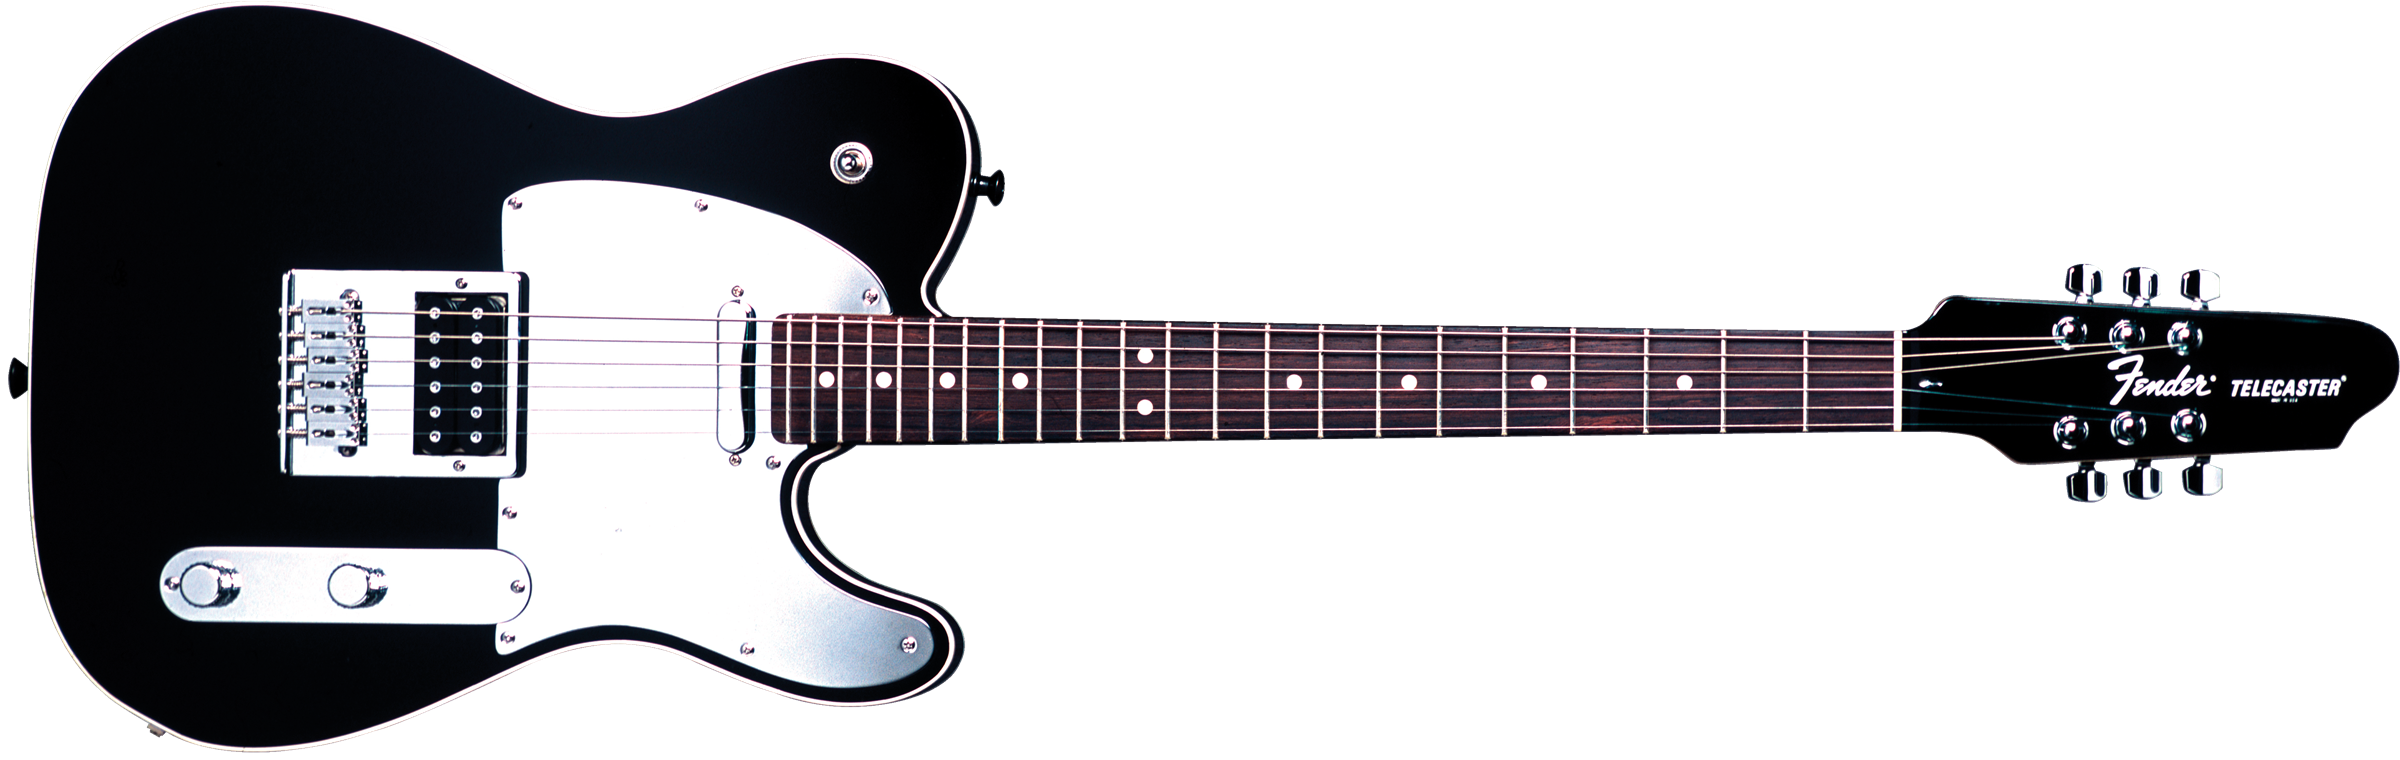 John 5 Signature Telecaster Telecaster Electric Guitars Fender Guitars Telecaster Fender Guitars Guitar